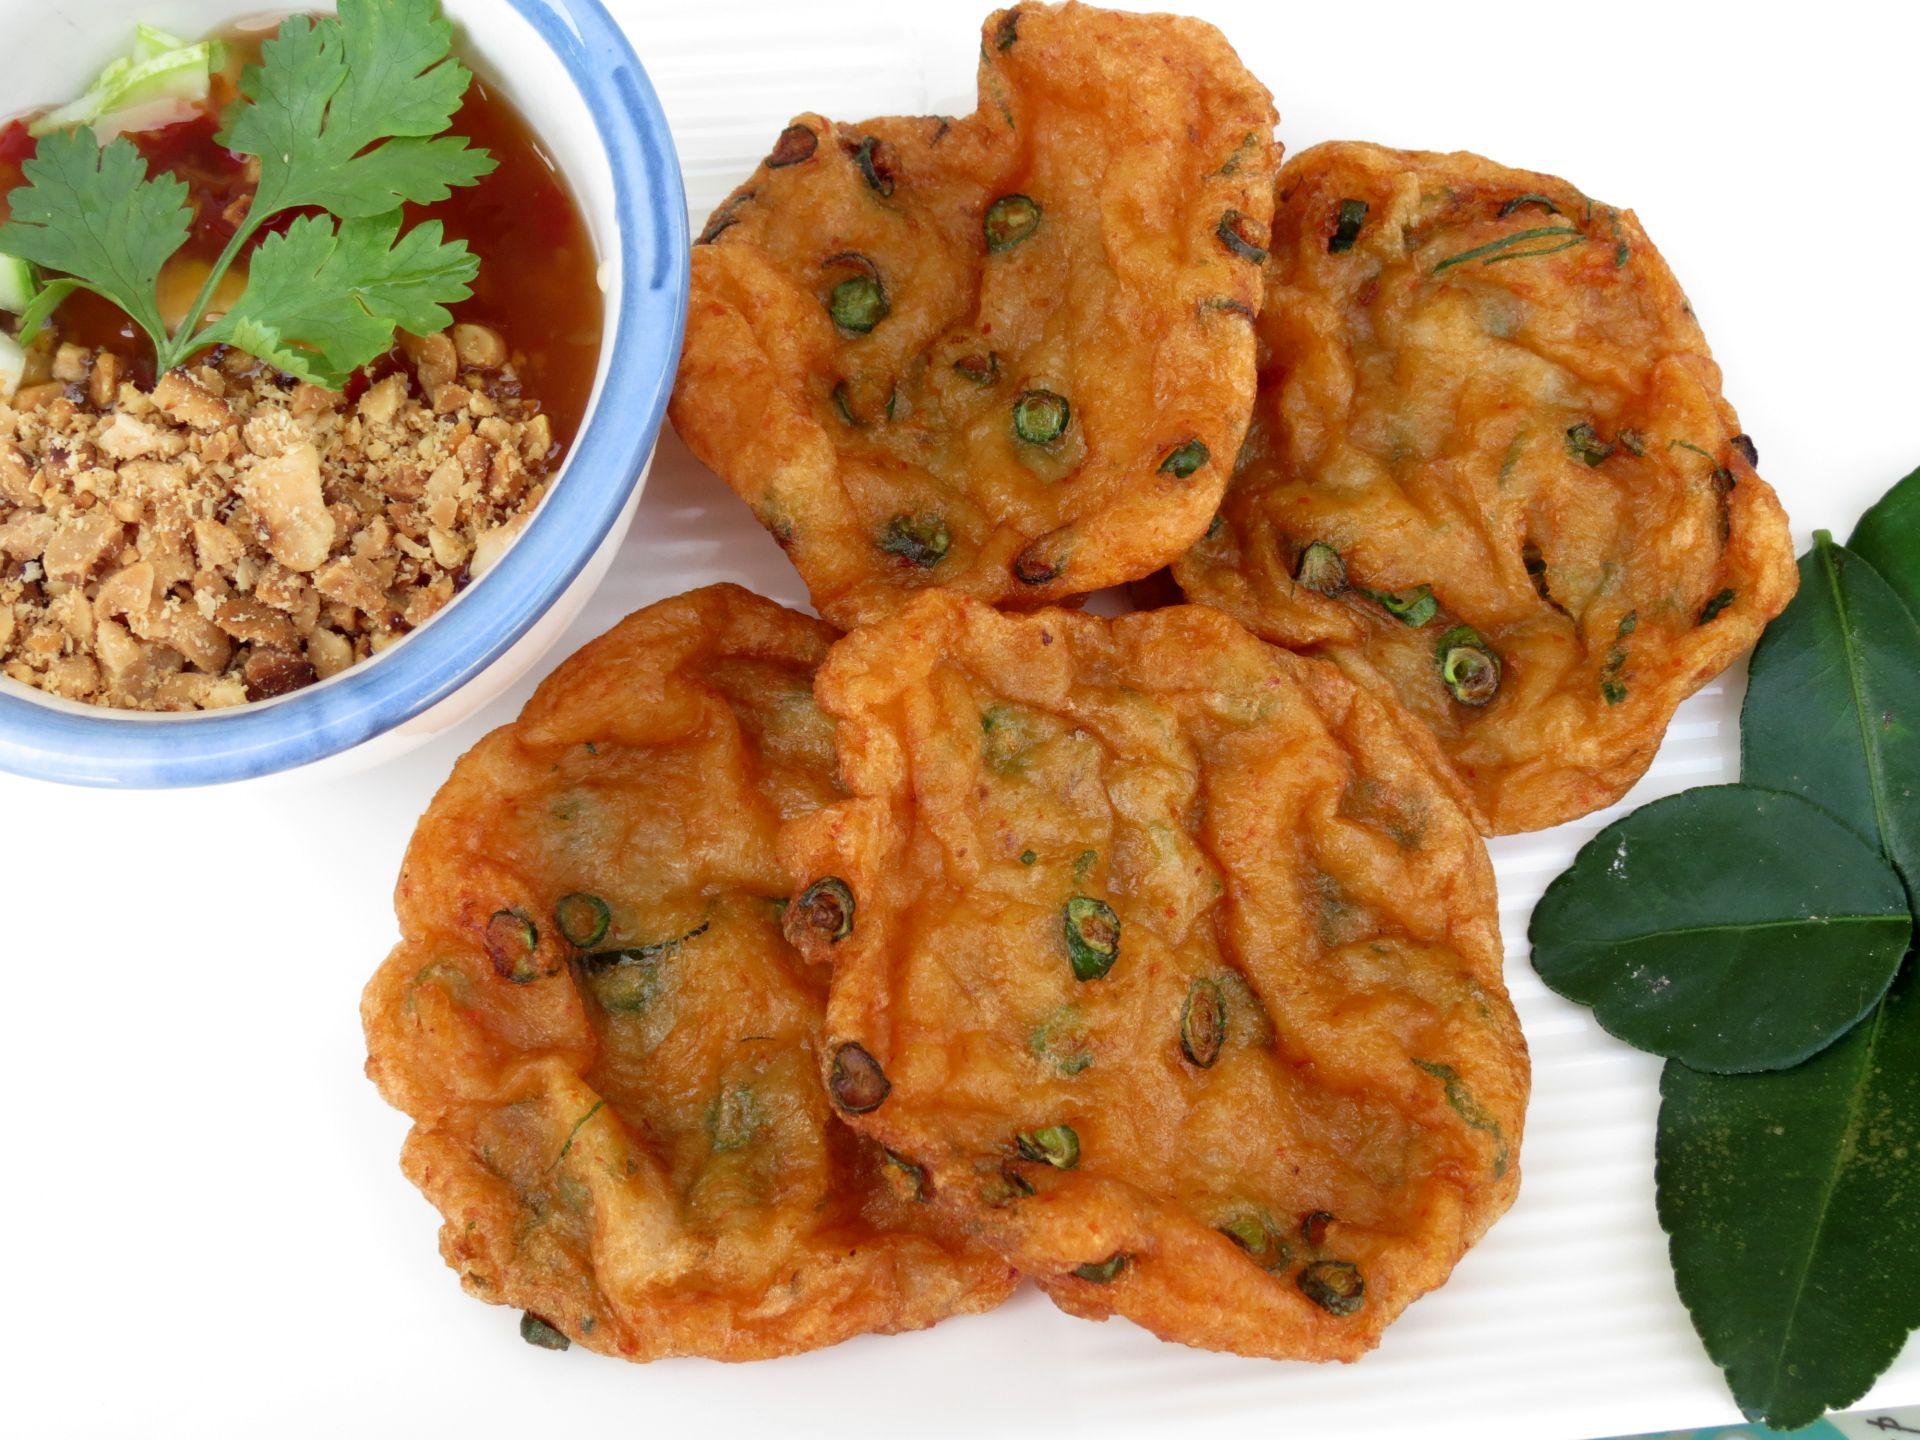 Fish cake recipe authentic thai the frugal chef for Fish cake recipe